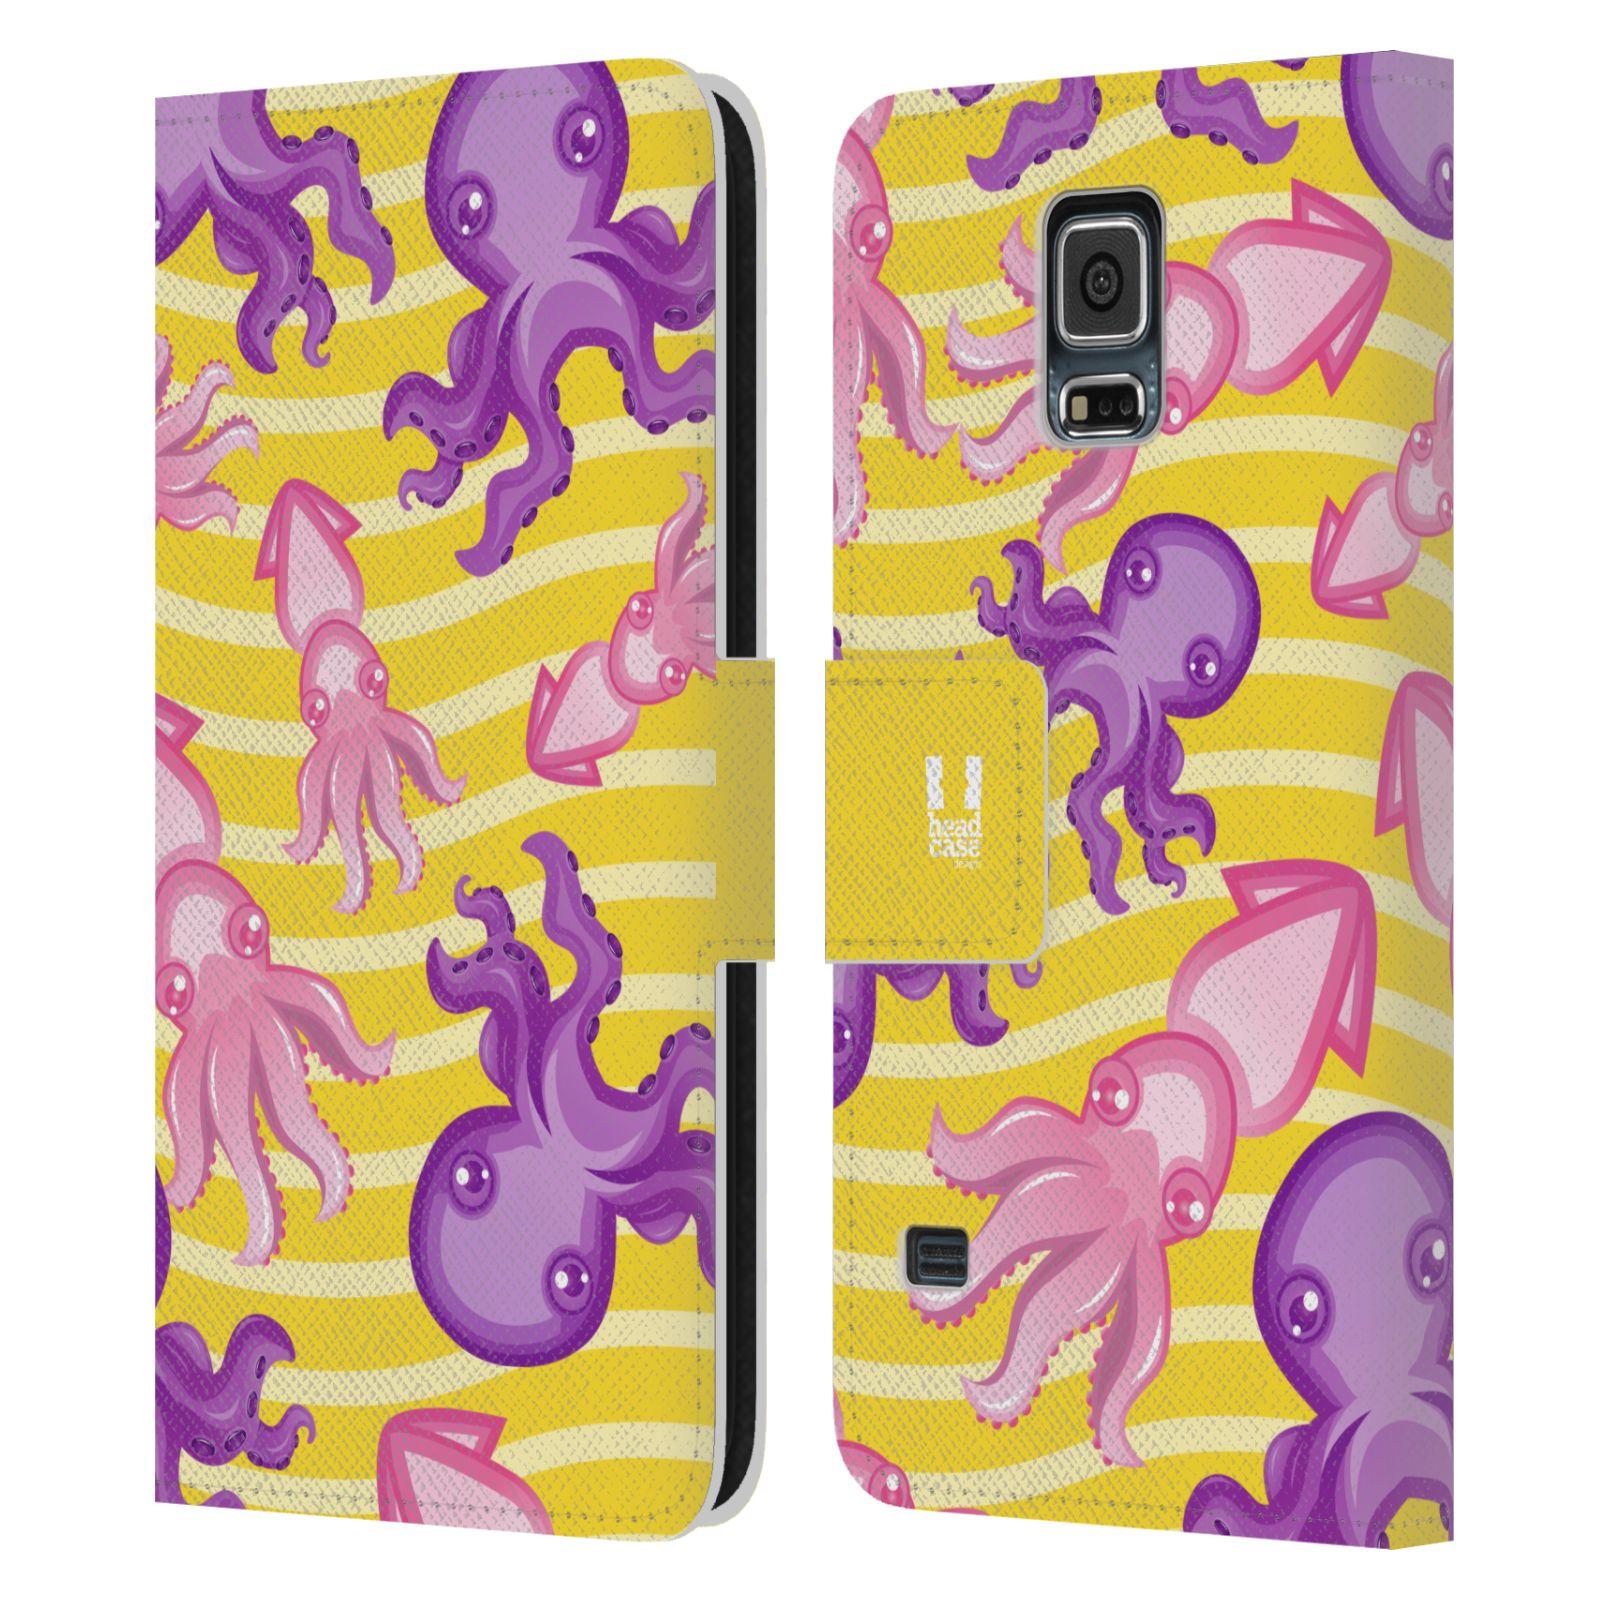 HEAD CASE Flipové pouzdro pro mobil Samsung Galaxy S5 / S5 NEO Mořský živočich chobotnice a krakatice žlutá barva